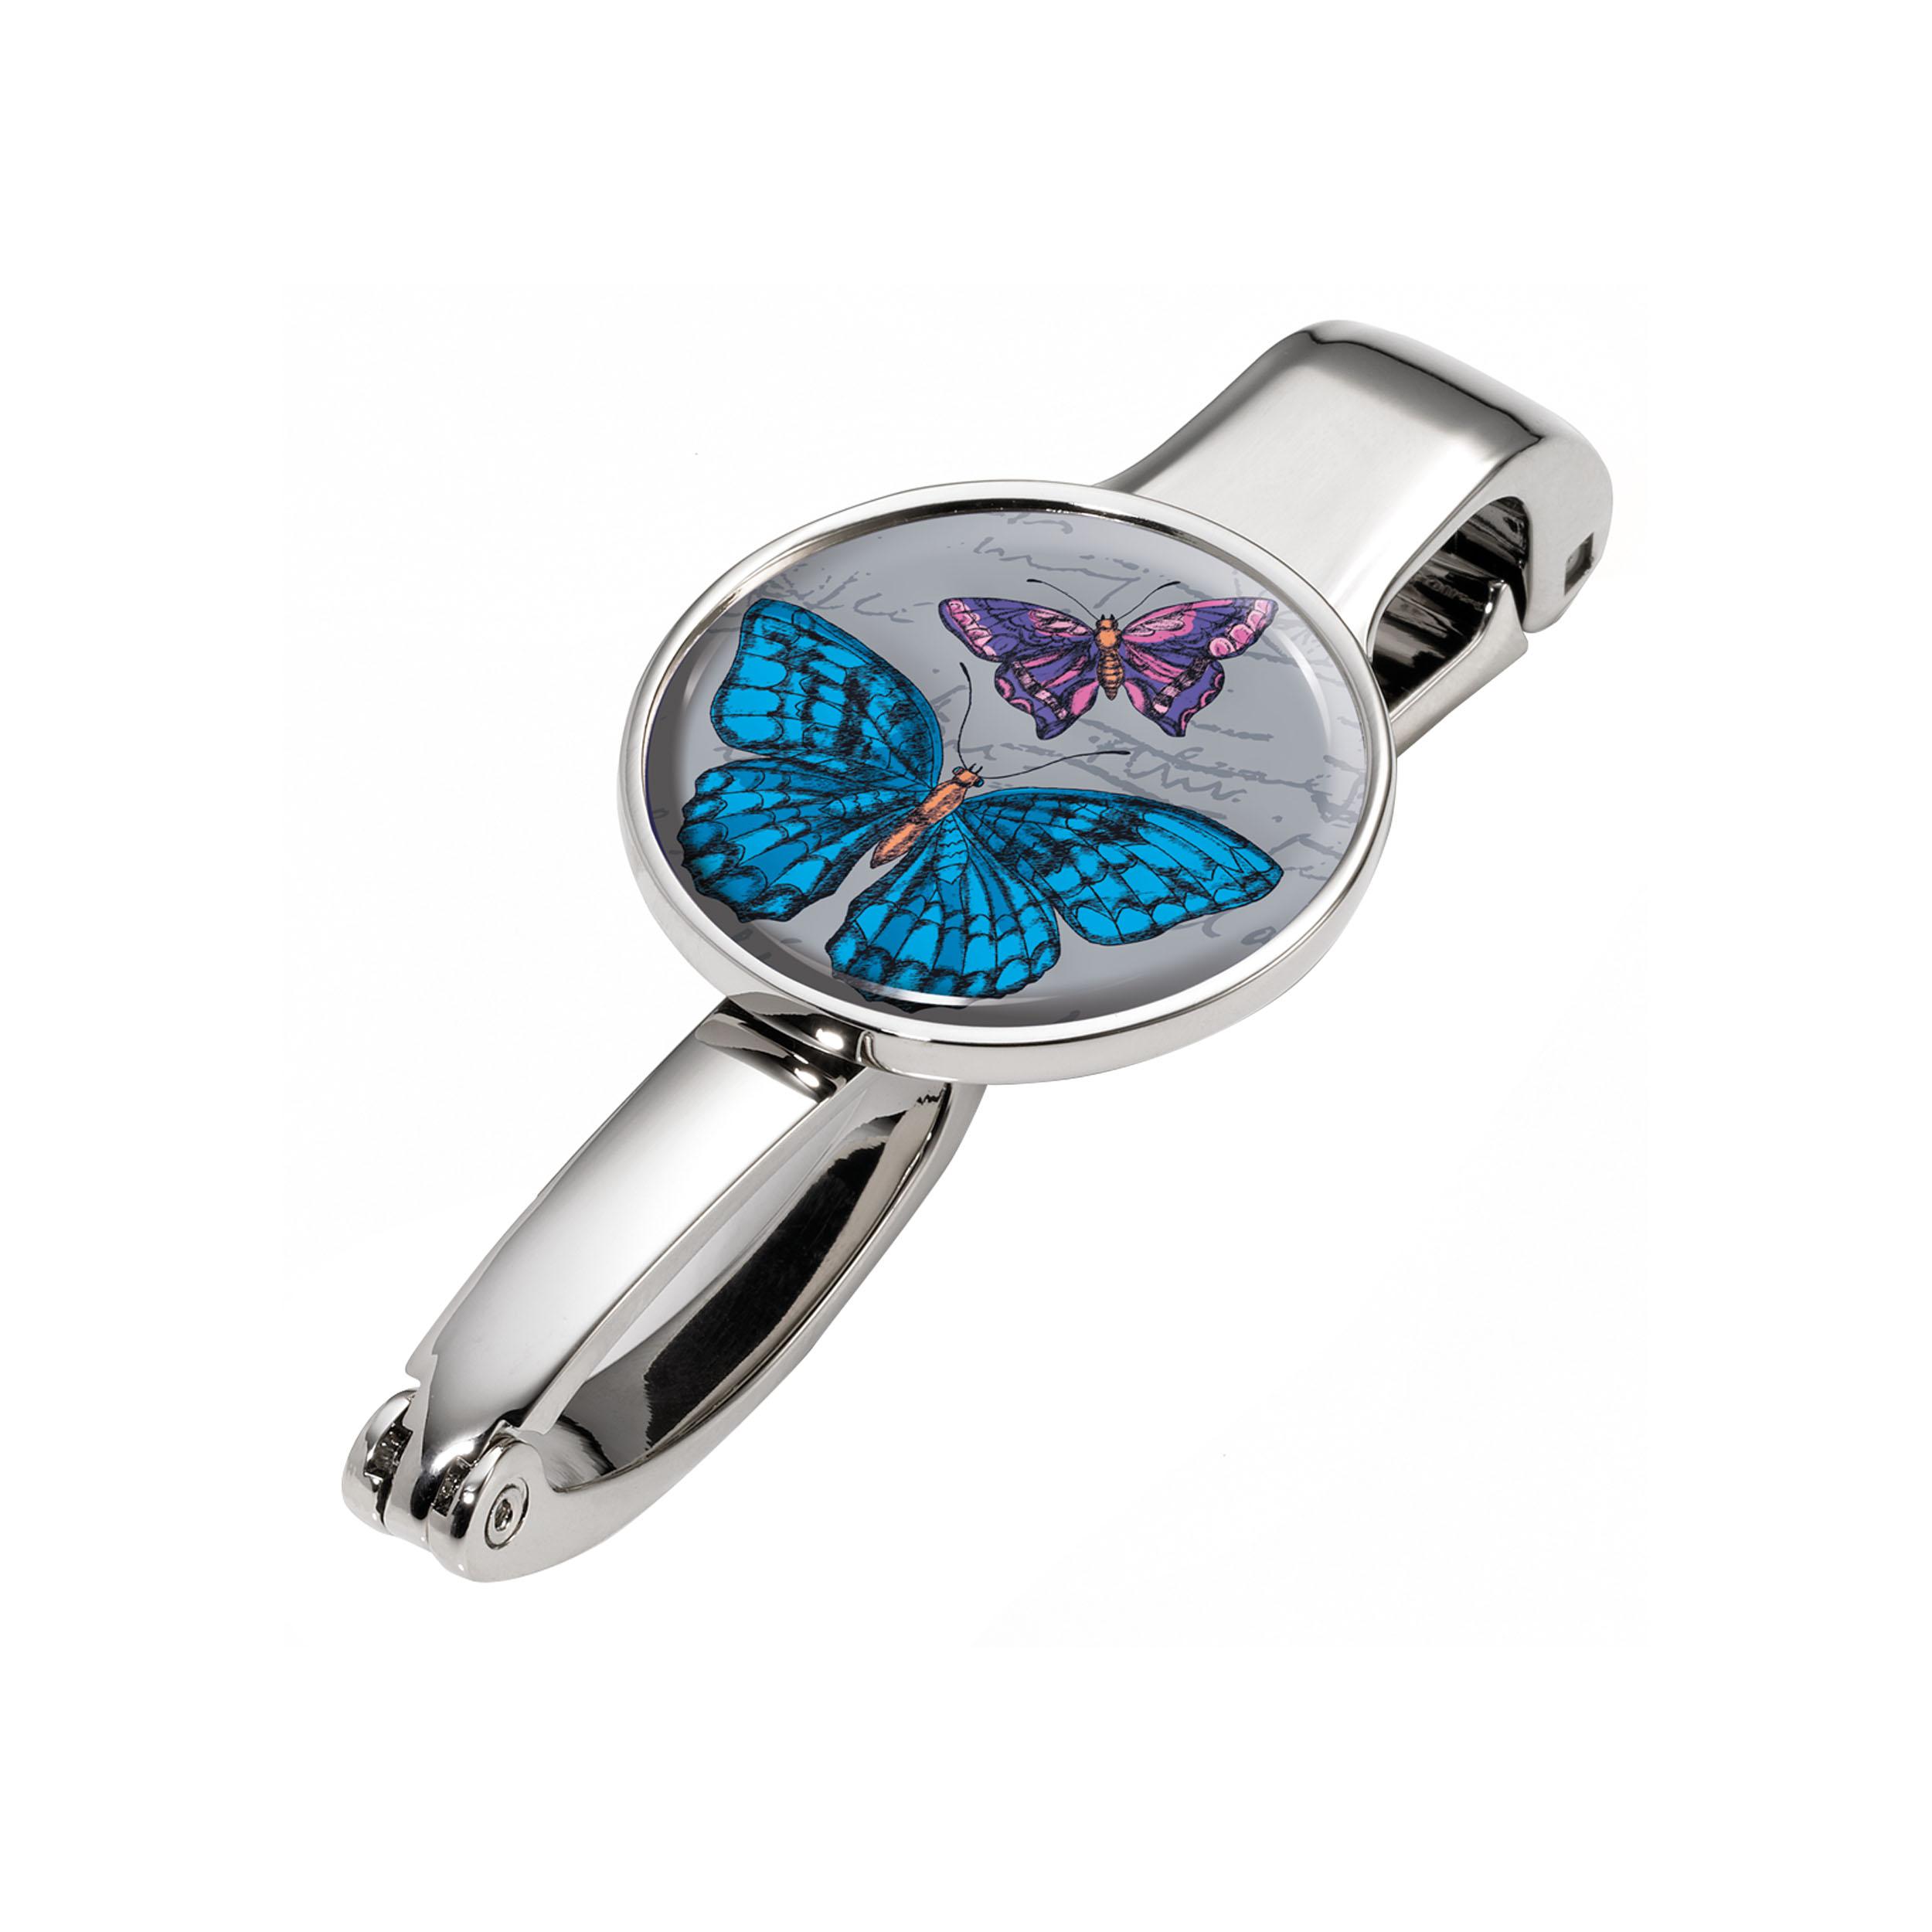 هنگر کیف ترویکا طرح Butterflies